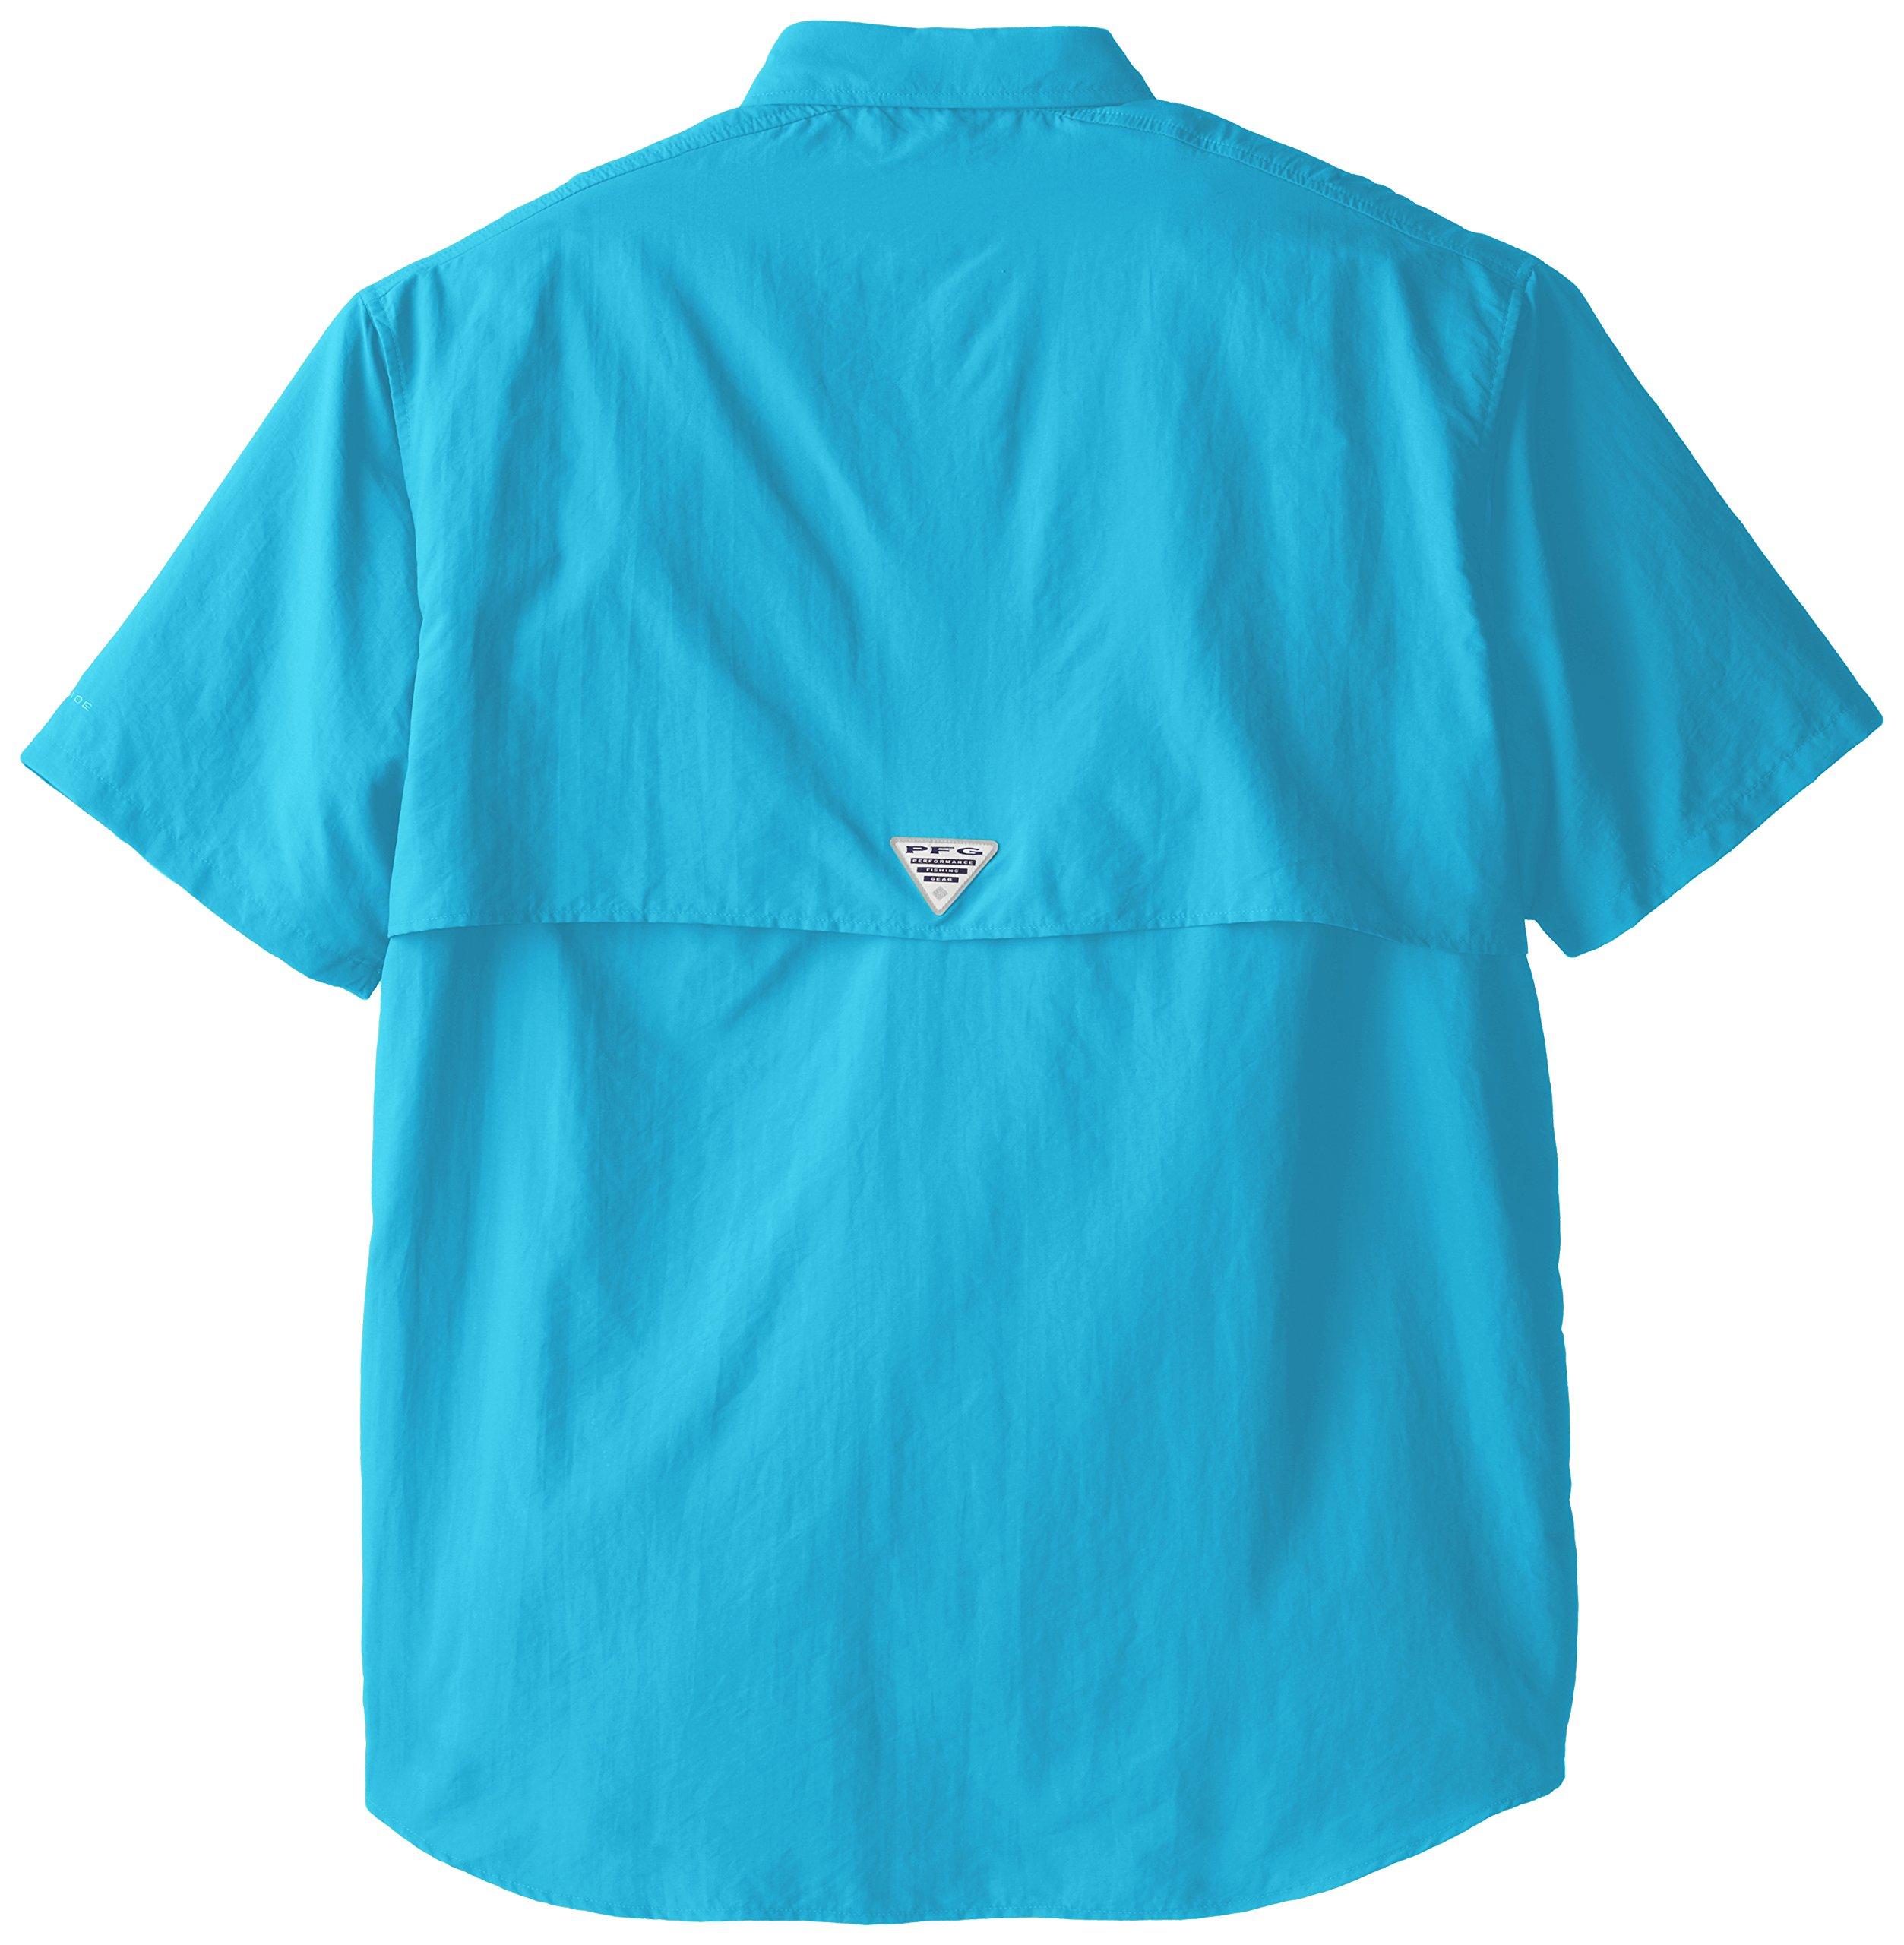 Columbia-Men-039-s-PFG-Bahama-II-Short-Sleeve-Shirt-T-Choose-SZ-color thumbnail 3